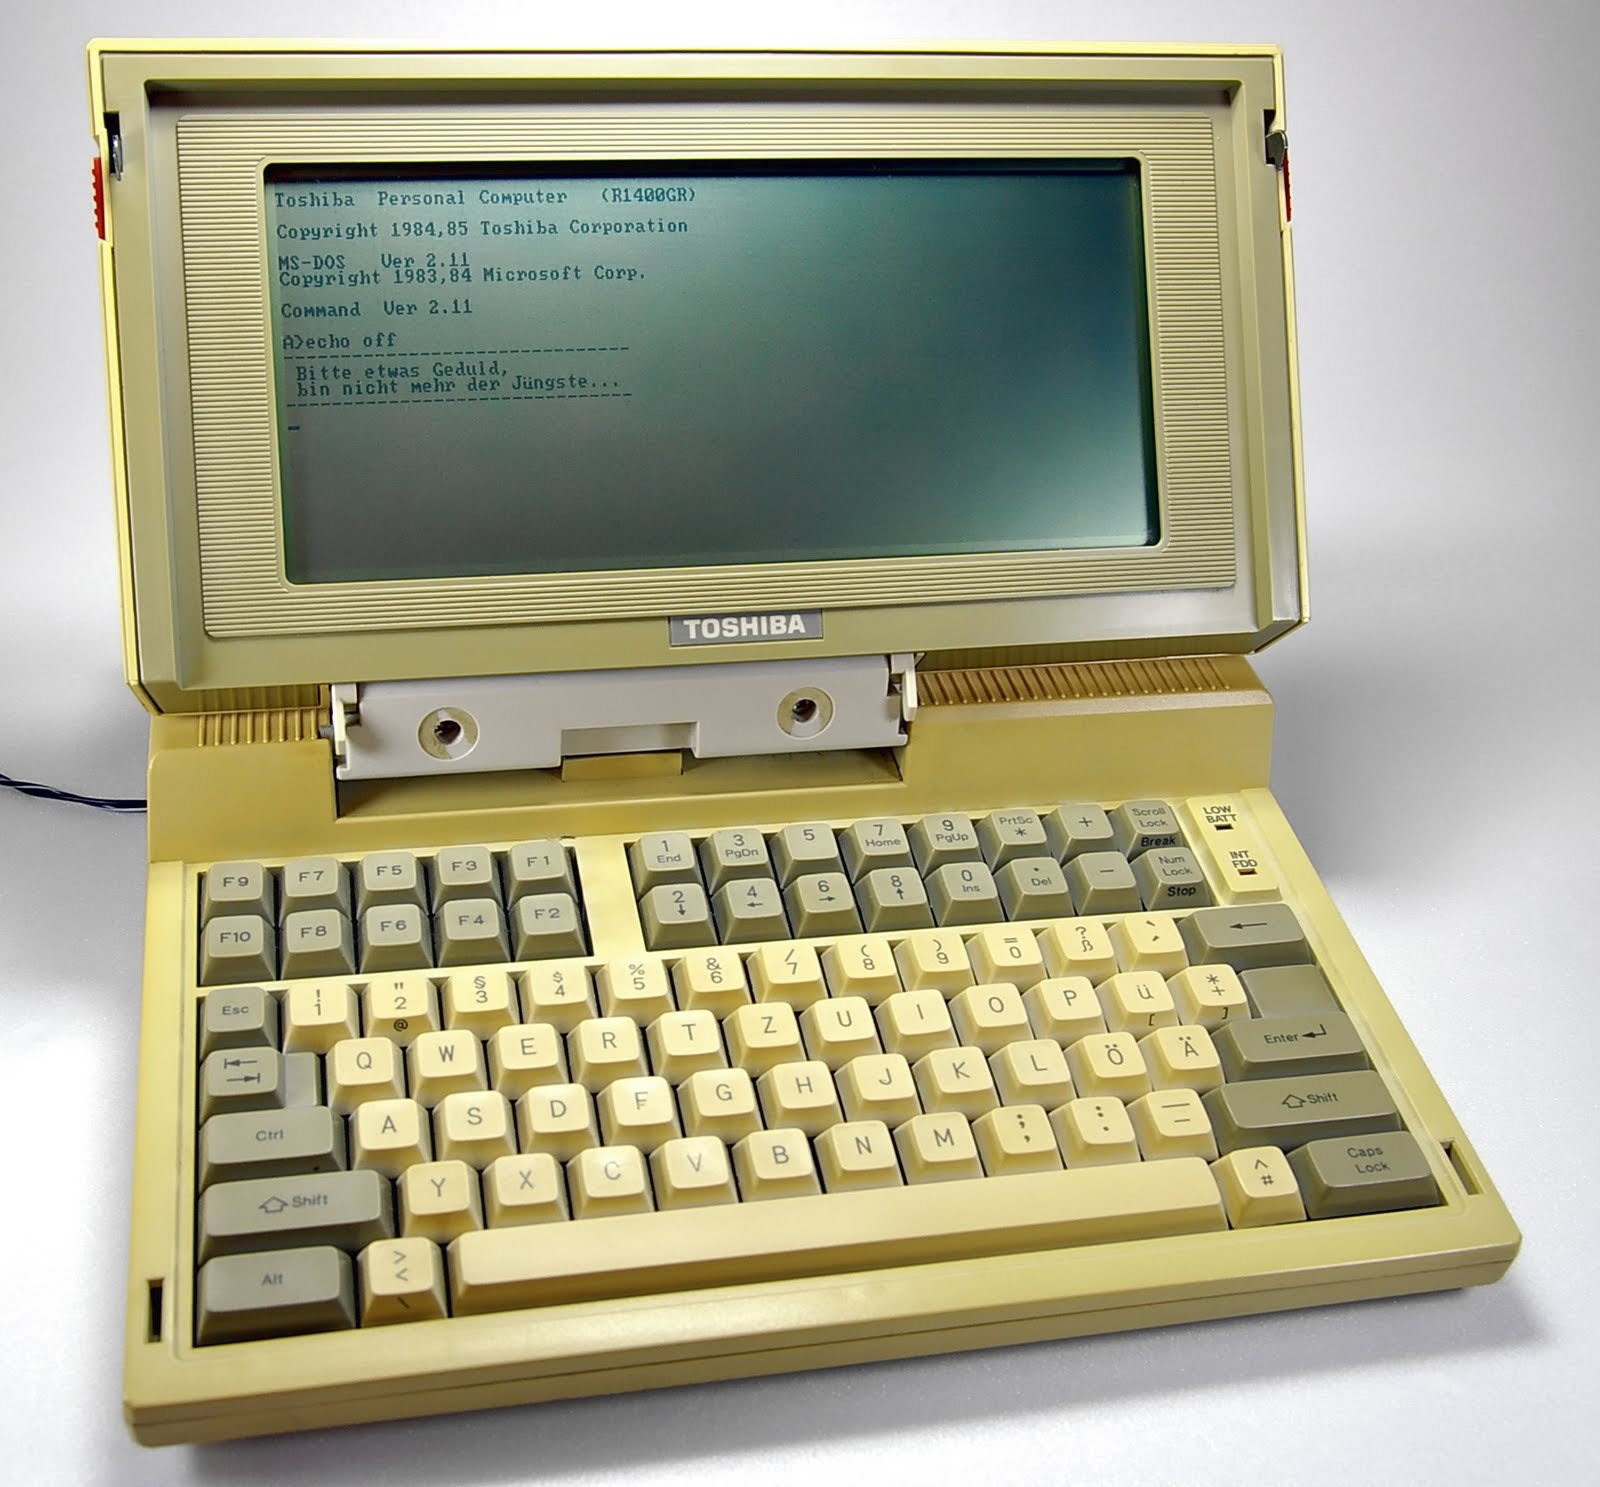 Toshiba Keyboard Diagram Everything About Wiring Aspire One Ao530 Schematic Zg8 Mainboard Notebook World U2019s First Laptop Tarun S Blog Satellite Qosmio